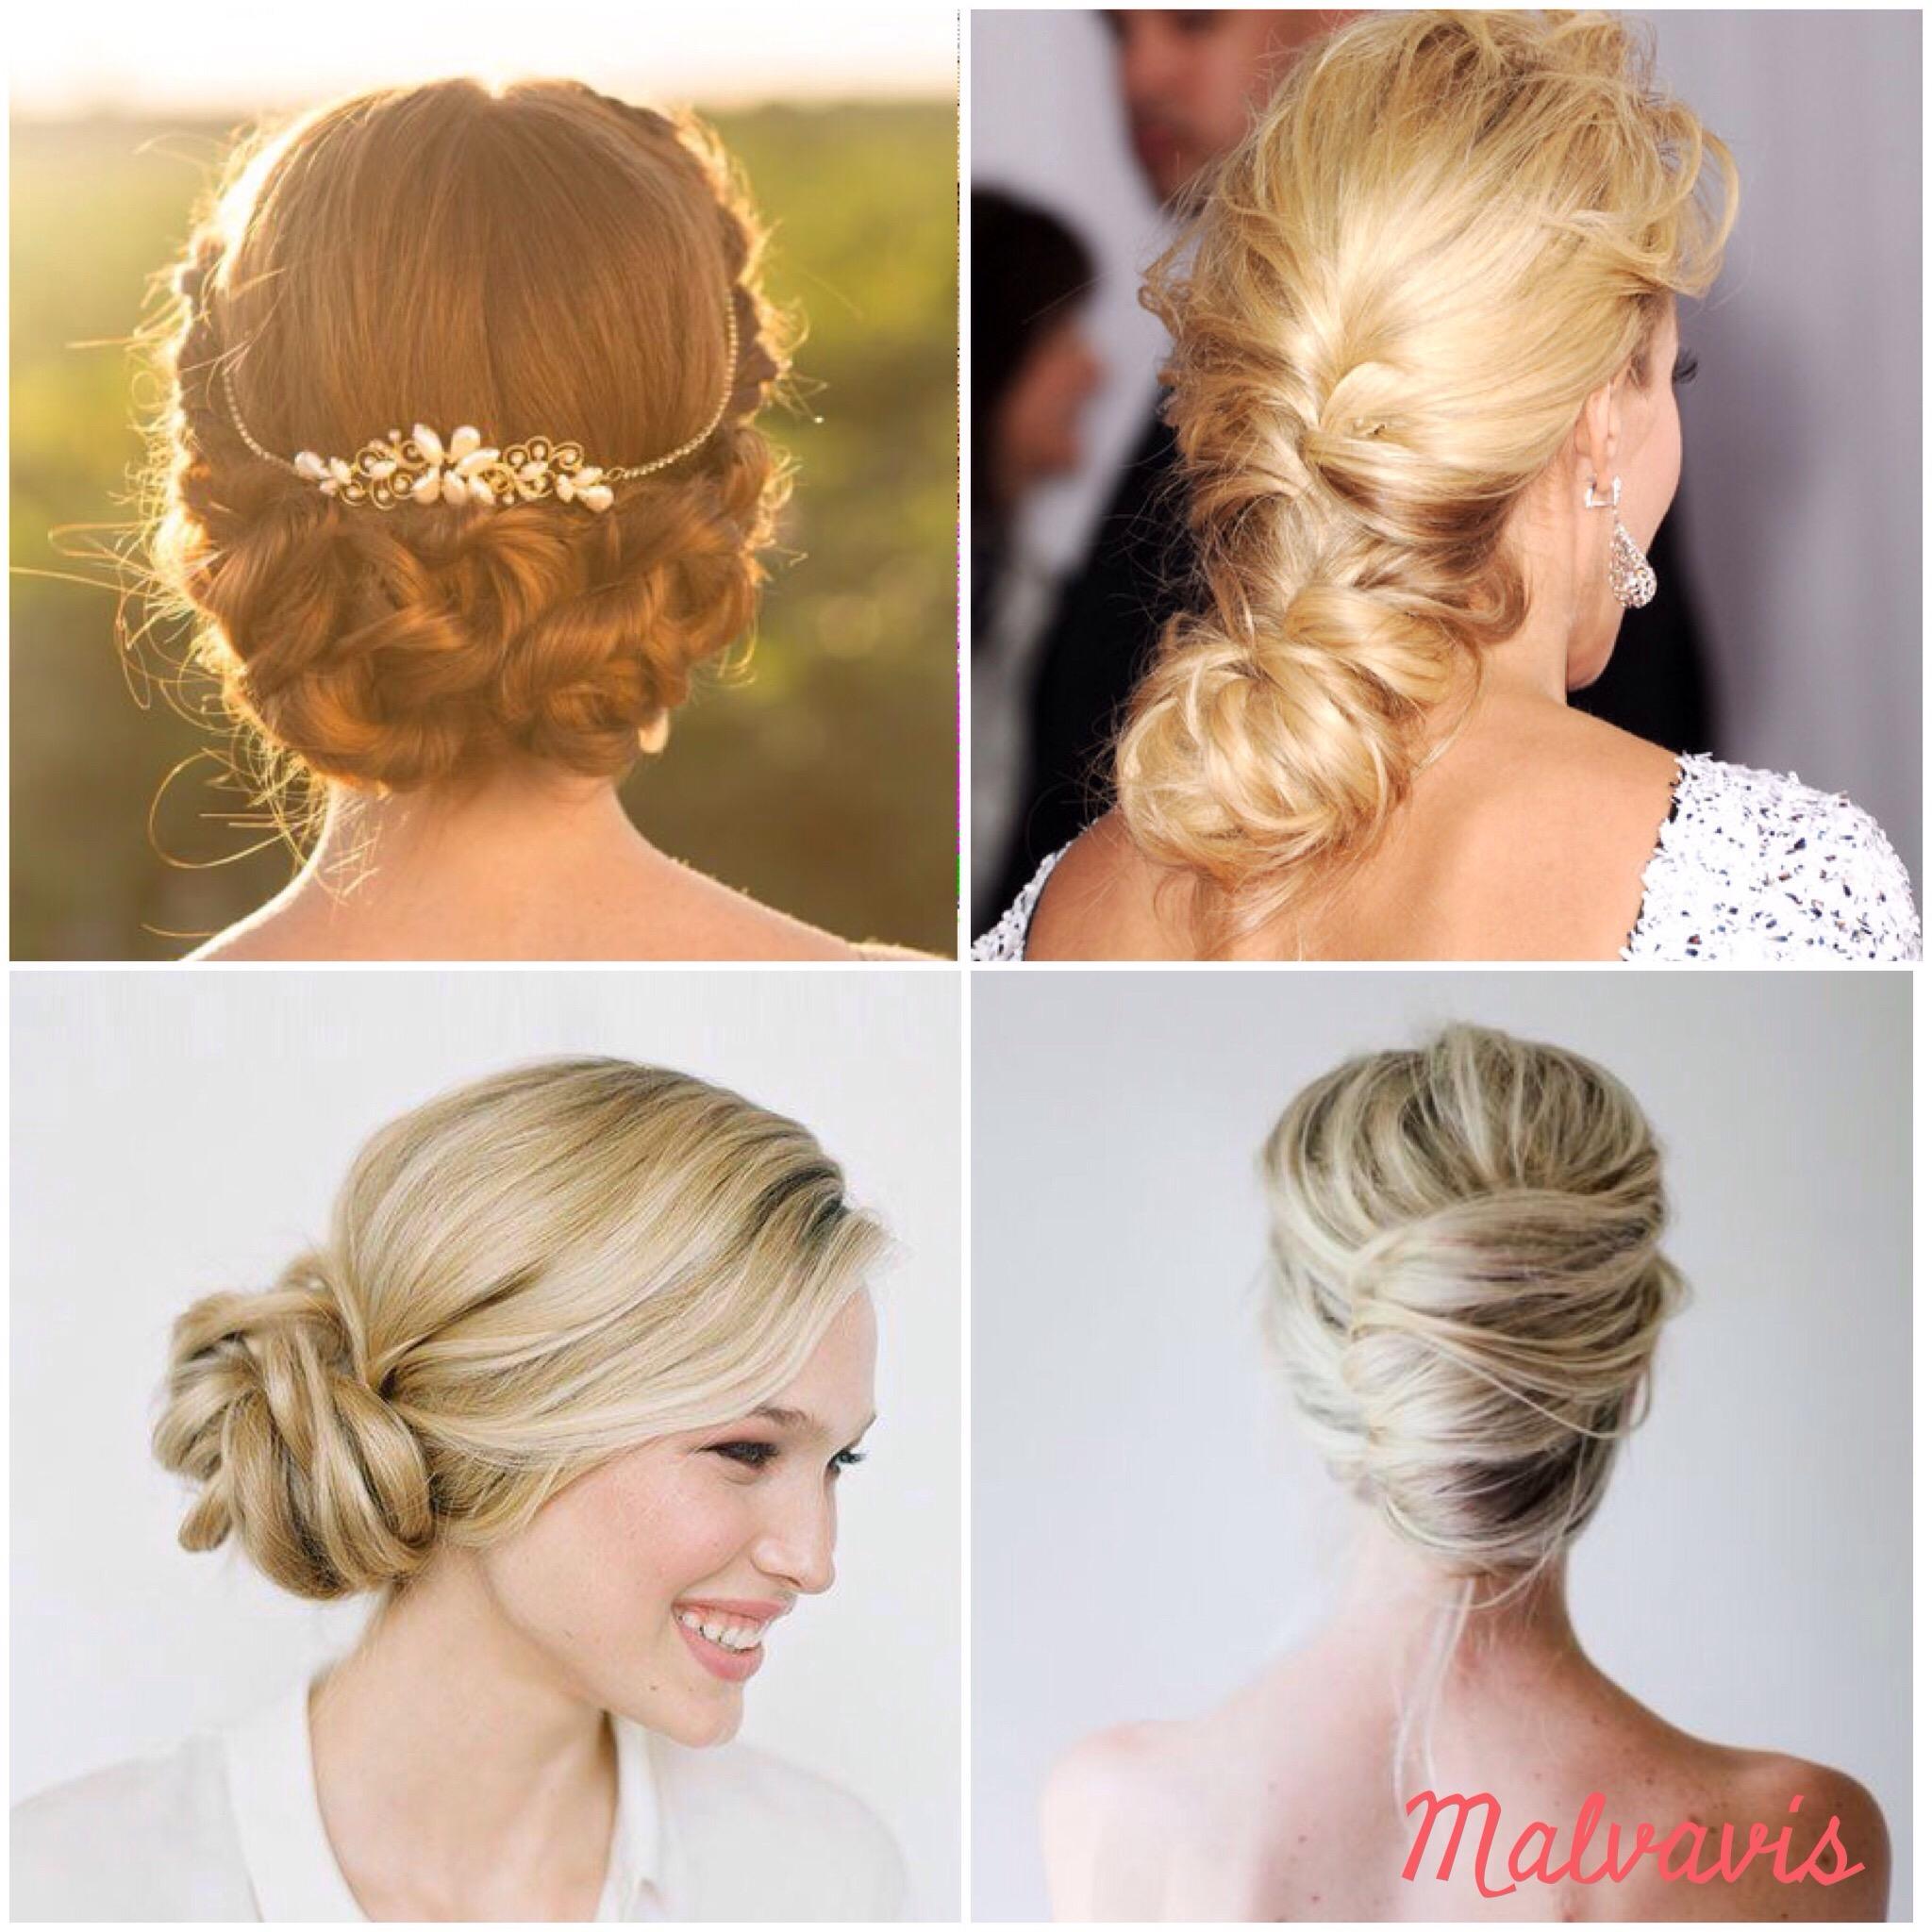 Peinados para invitadas malvavis - Peinados de boda para invitadas ...